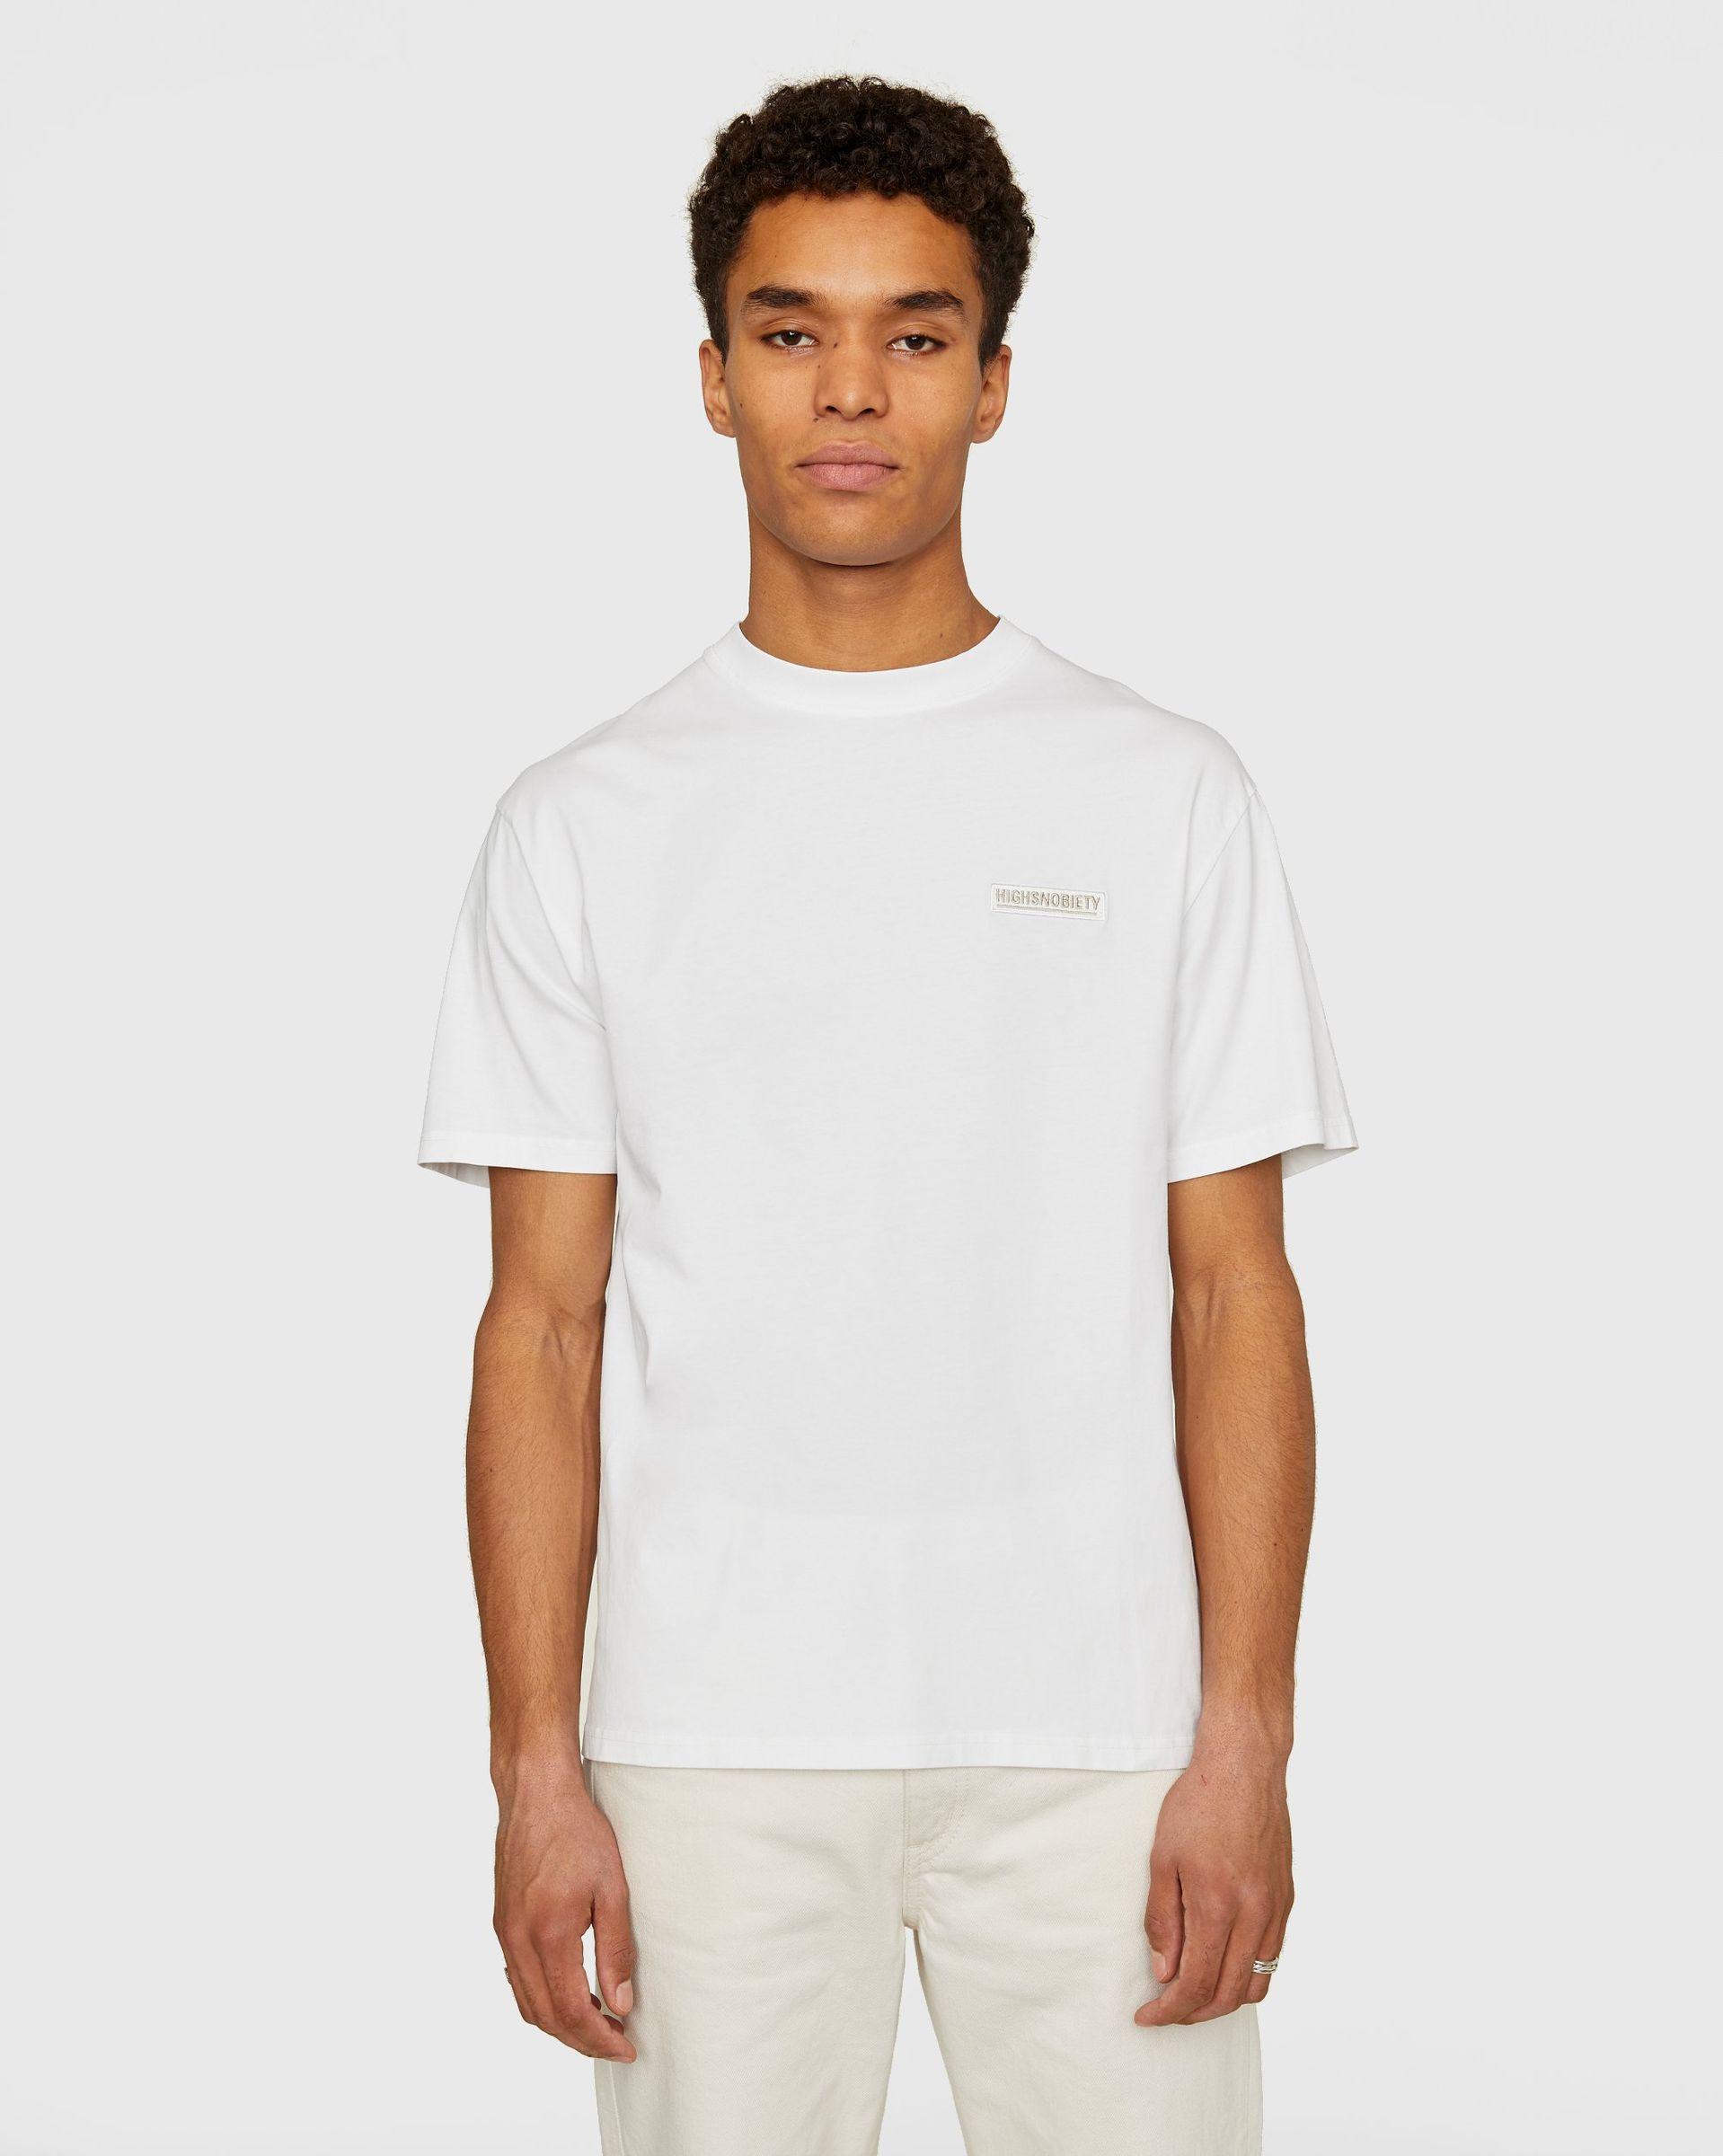 Highsnobiety Staples - T-Shirt White - Image 2